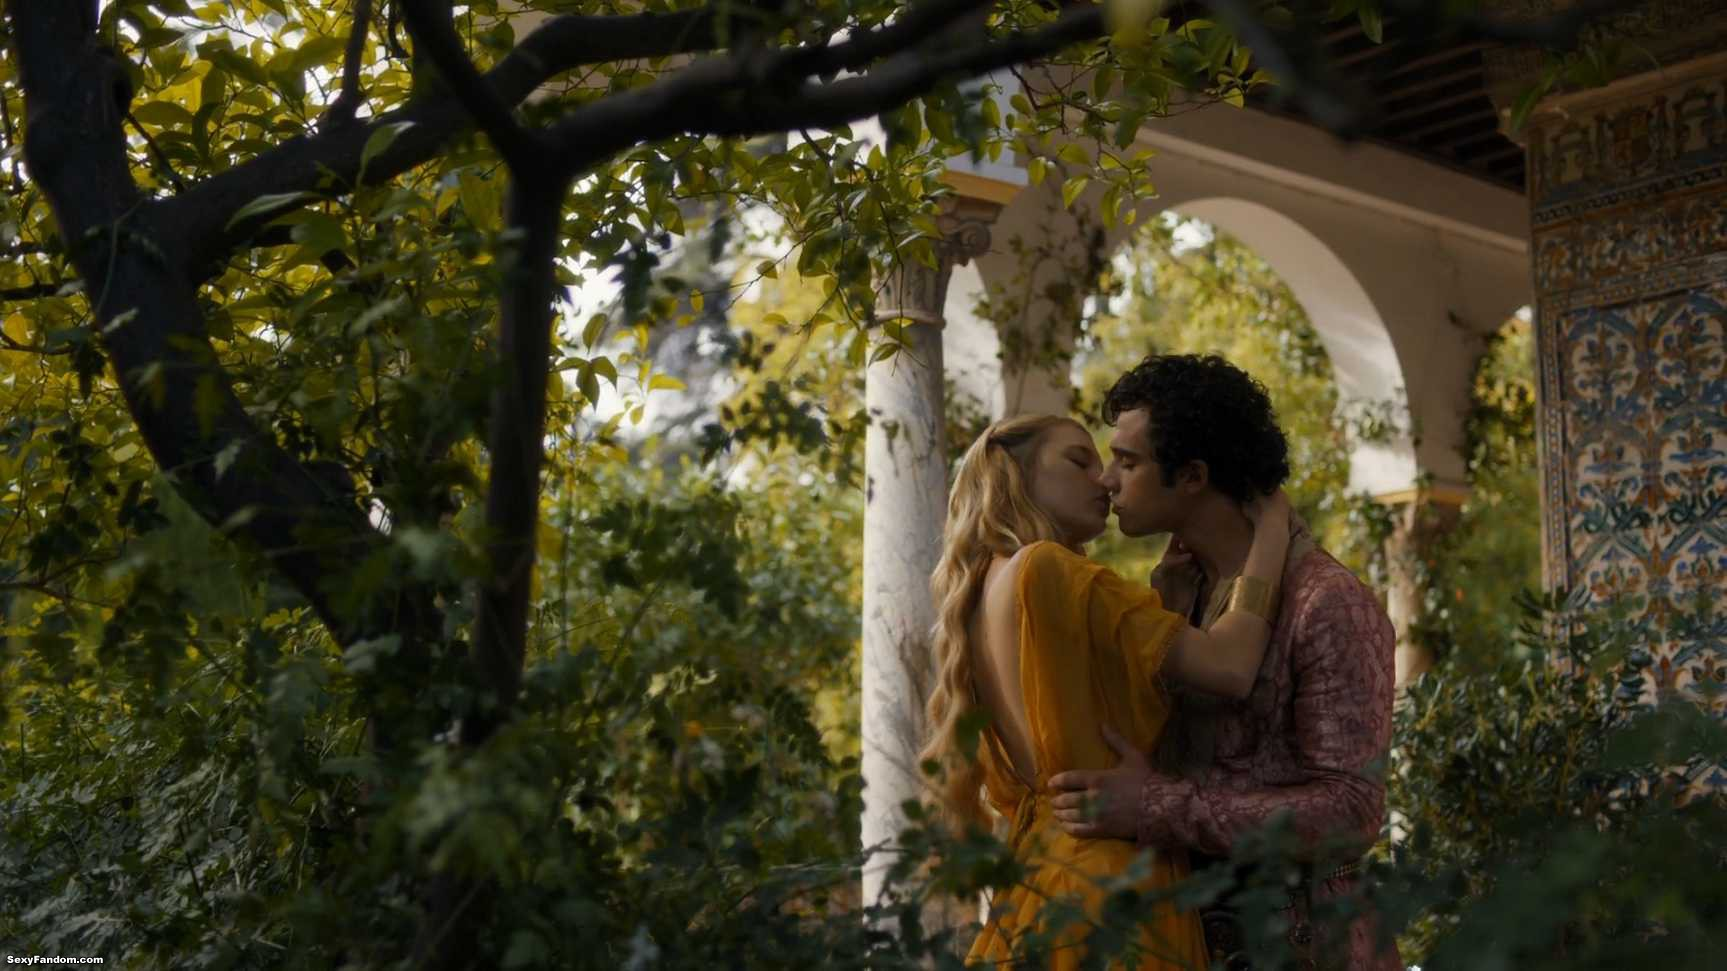 Game of Thrones 46 – Unbowed, Unbent, Unimpressed